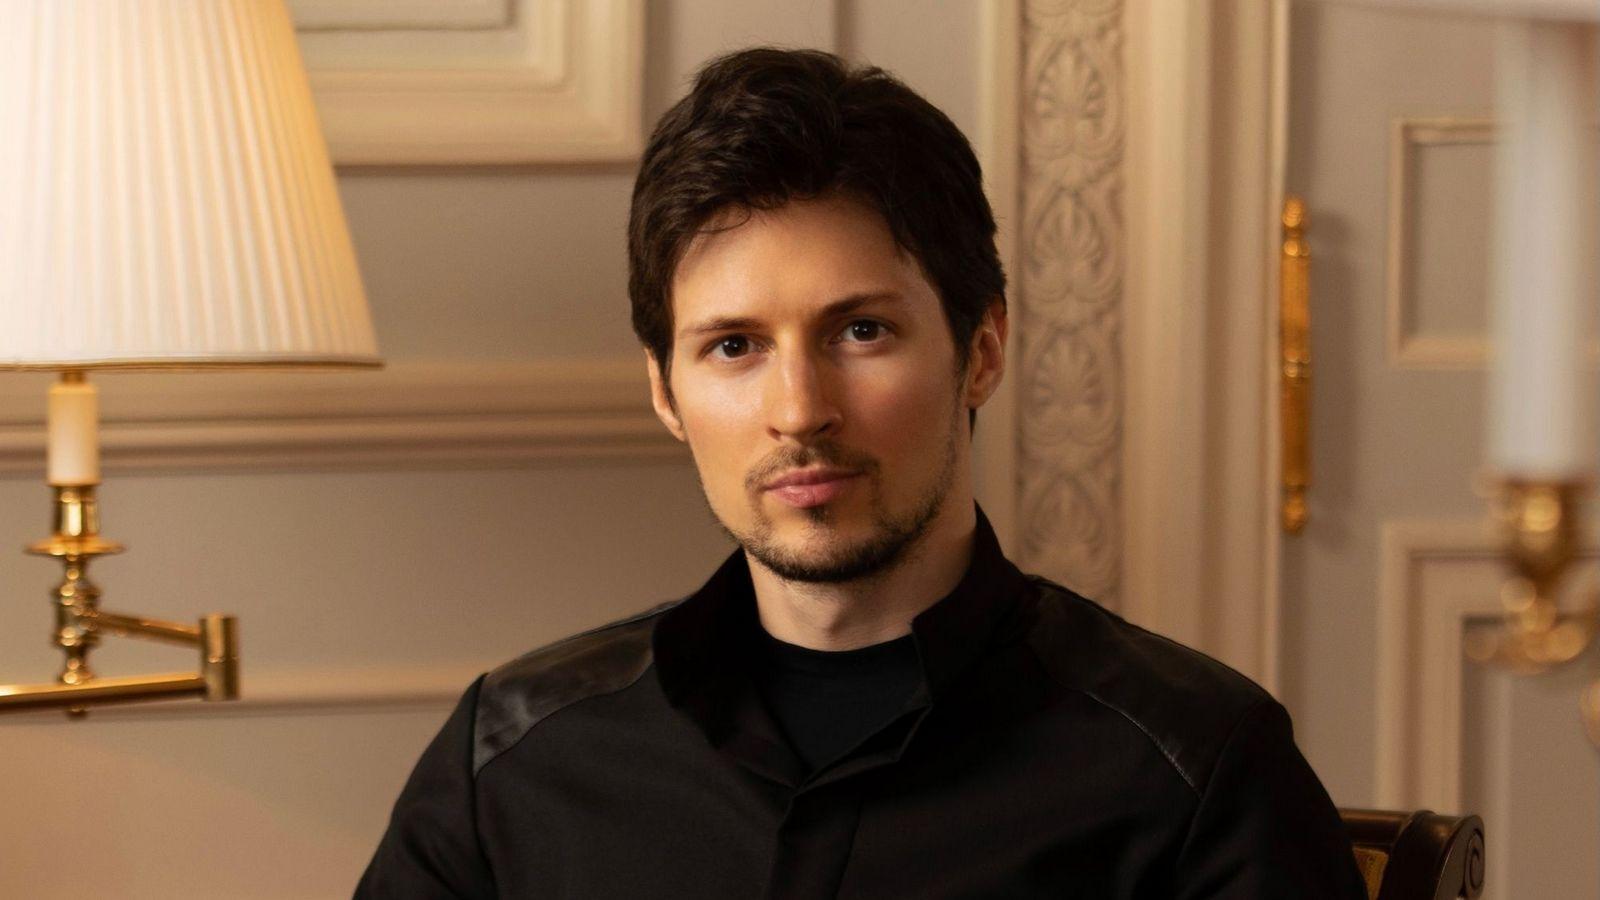 Павел Дуров назвал причину популярности теорий заговора